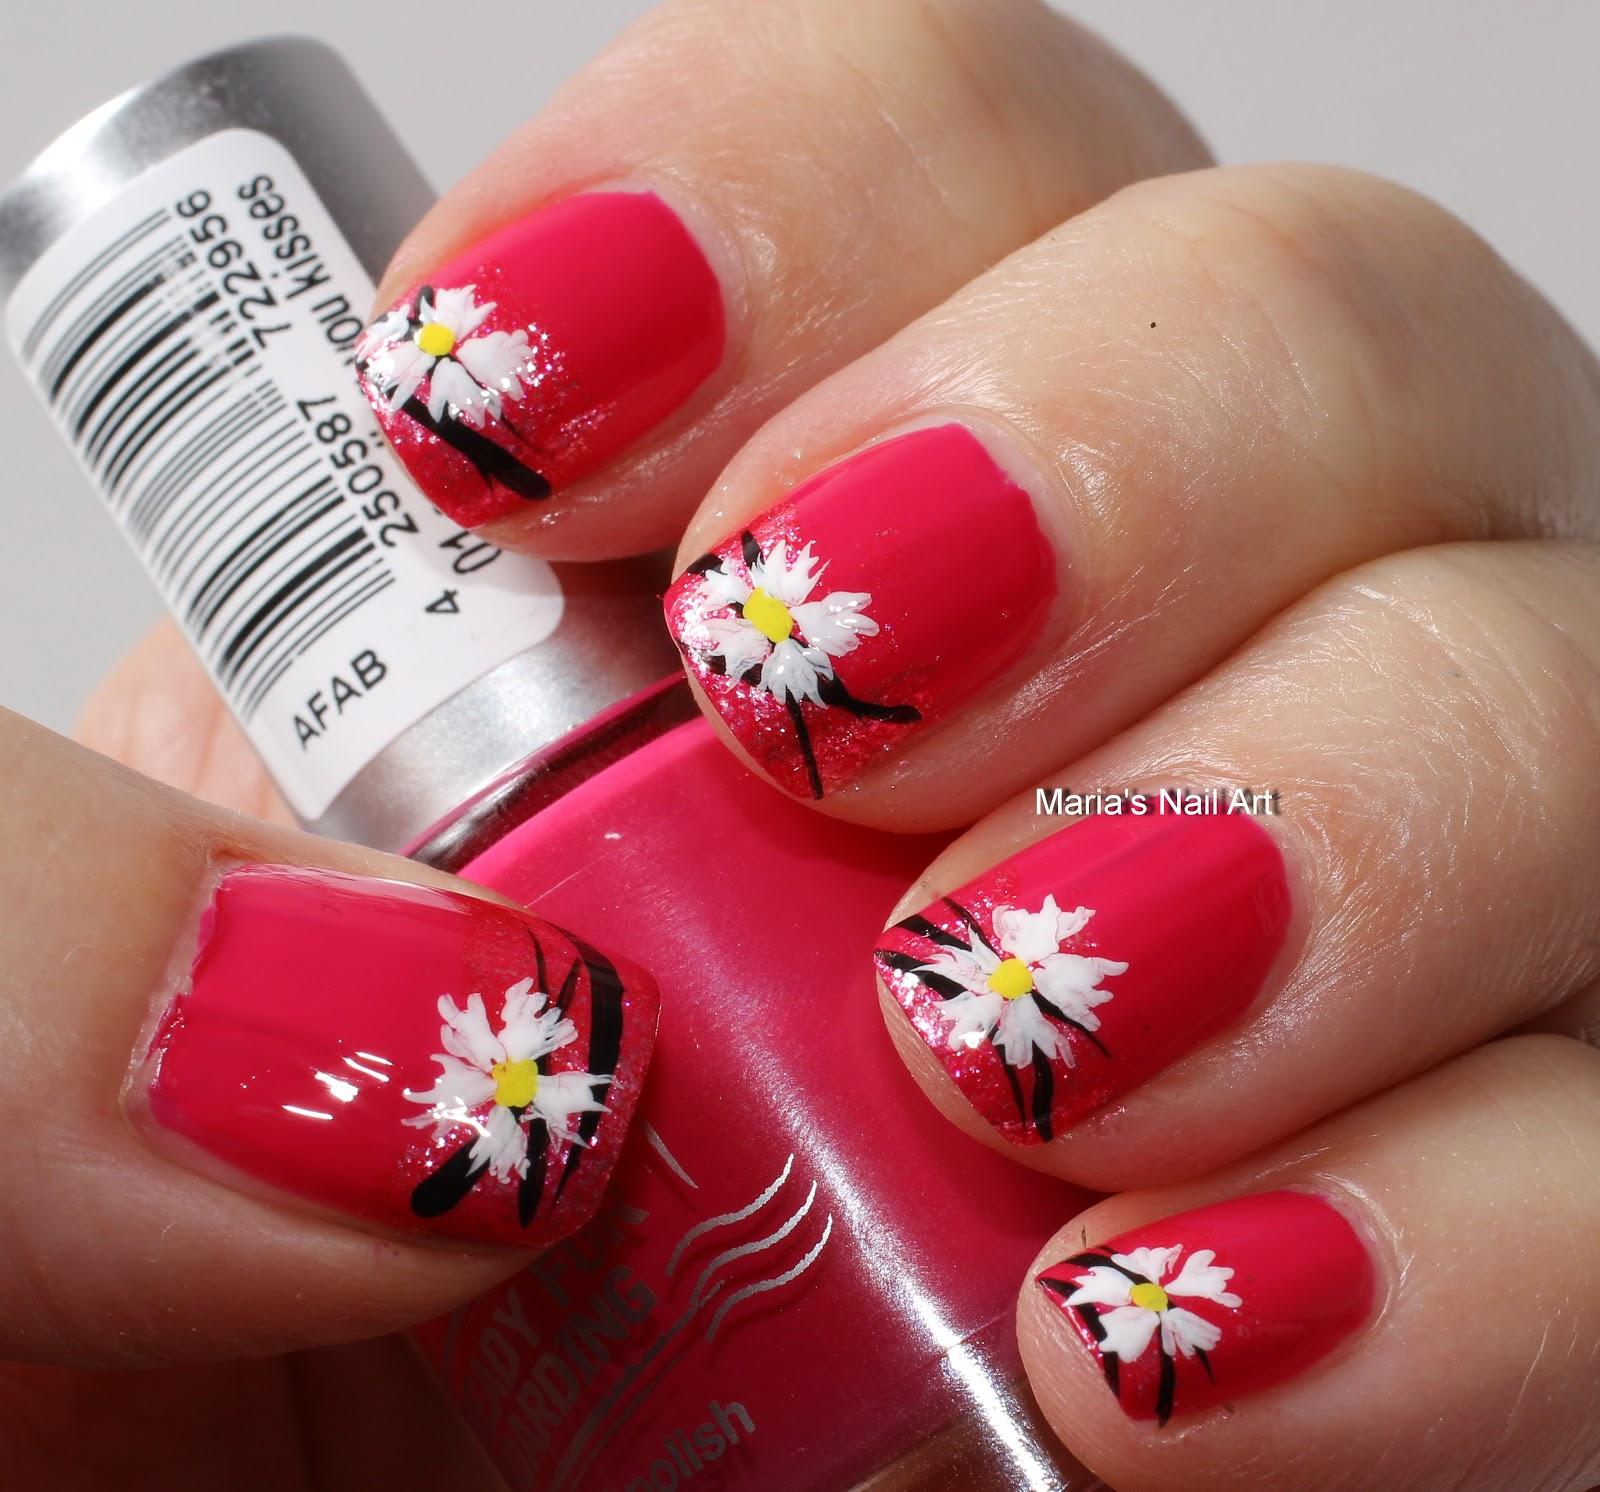 Marias Nail Art and Polish Blog: Sending you kisses and flowers